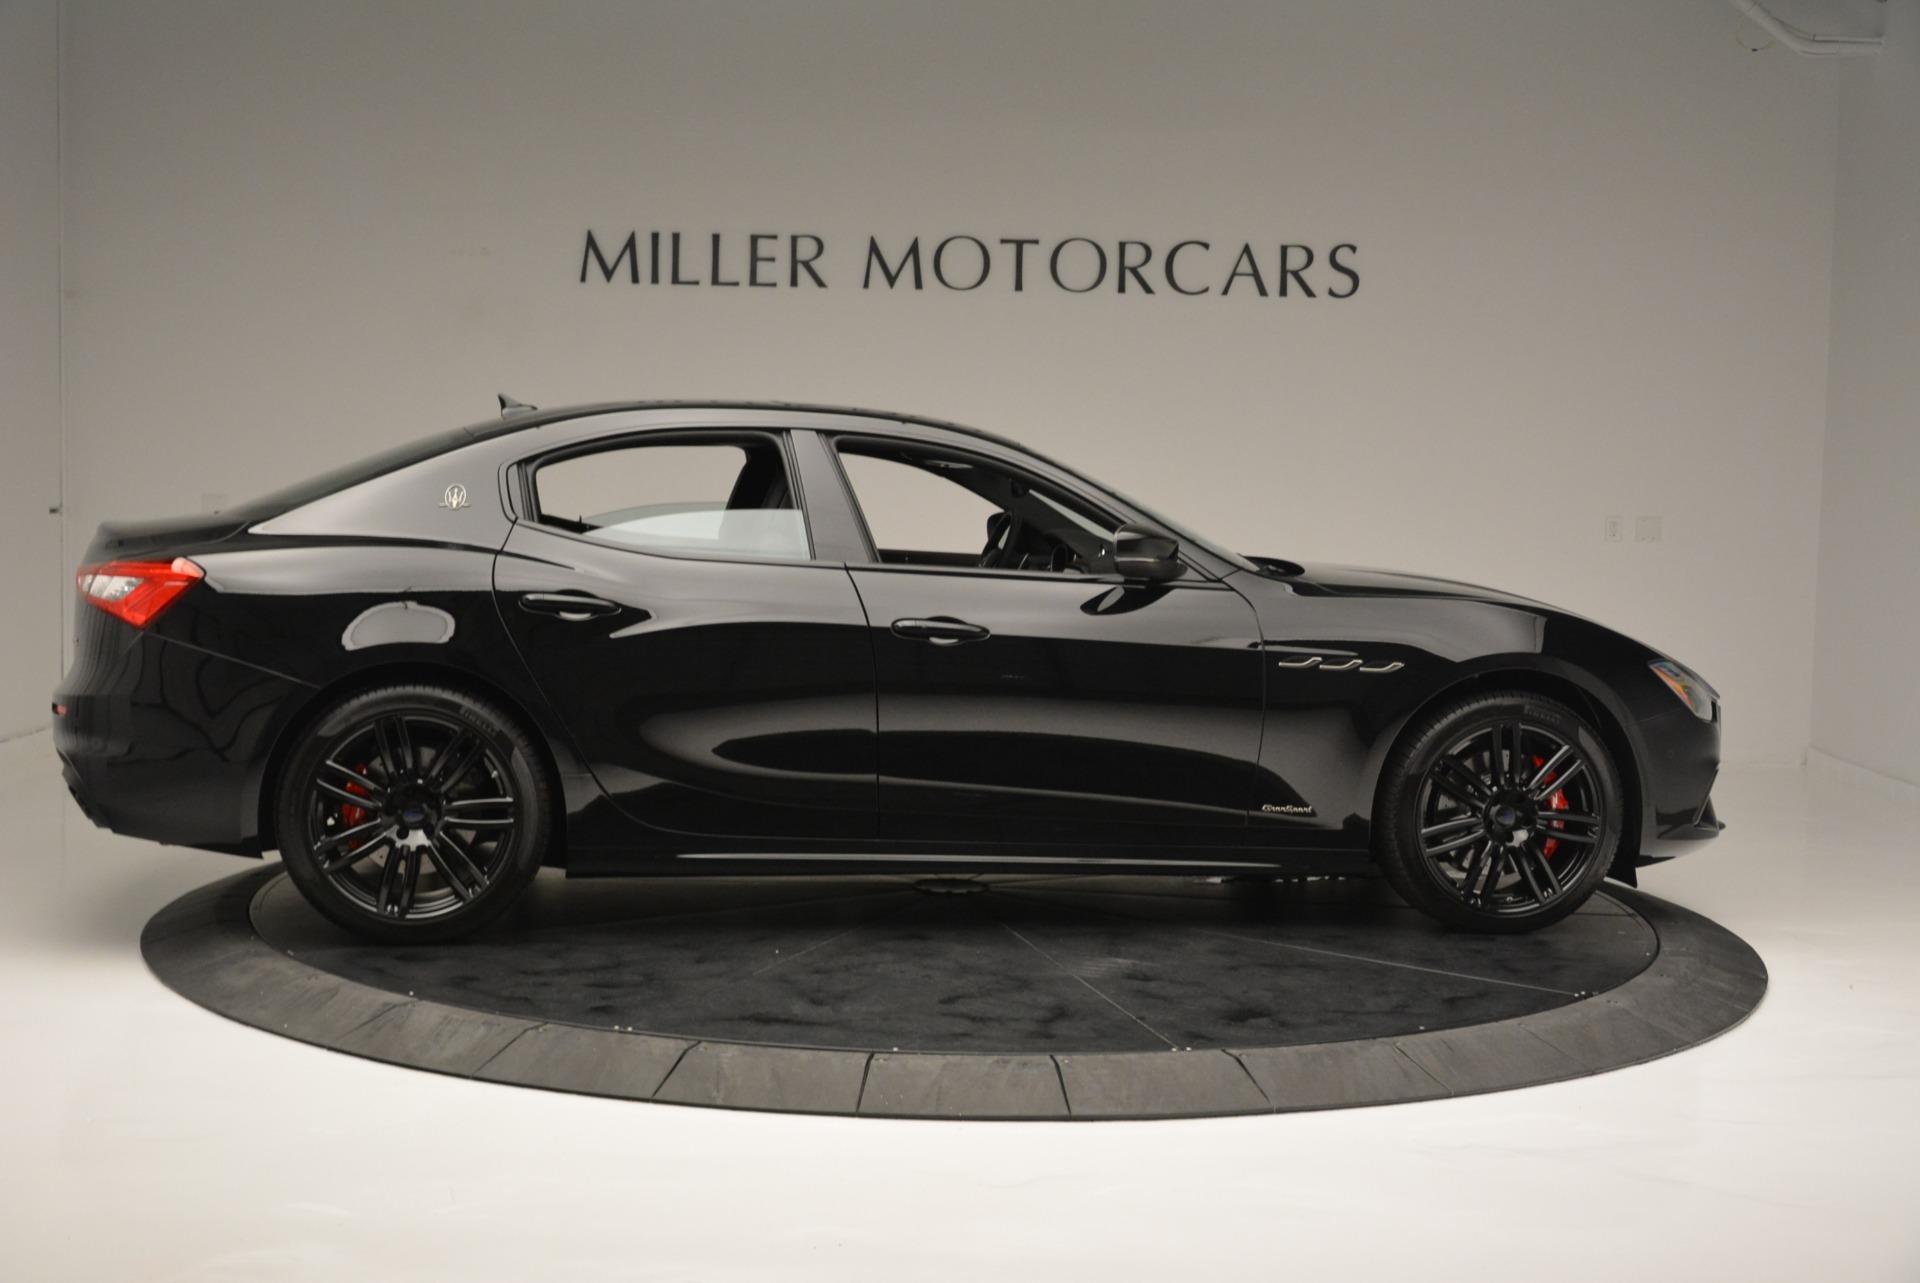 New 2018 Maserati Ghibli SQ4 GranSport Nerissimo For Sale In Westport, CT 2368_p9